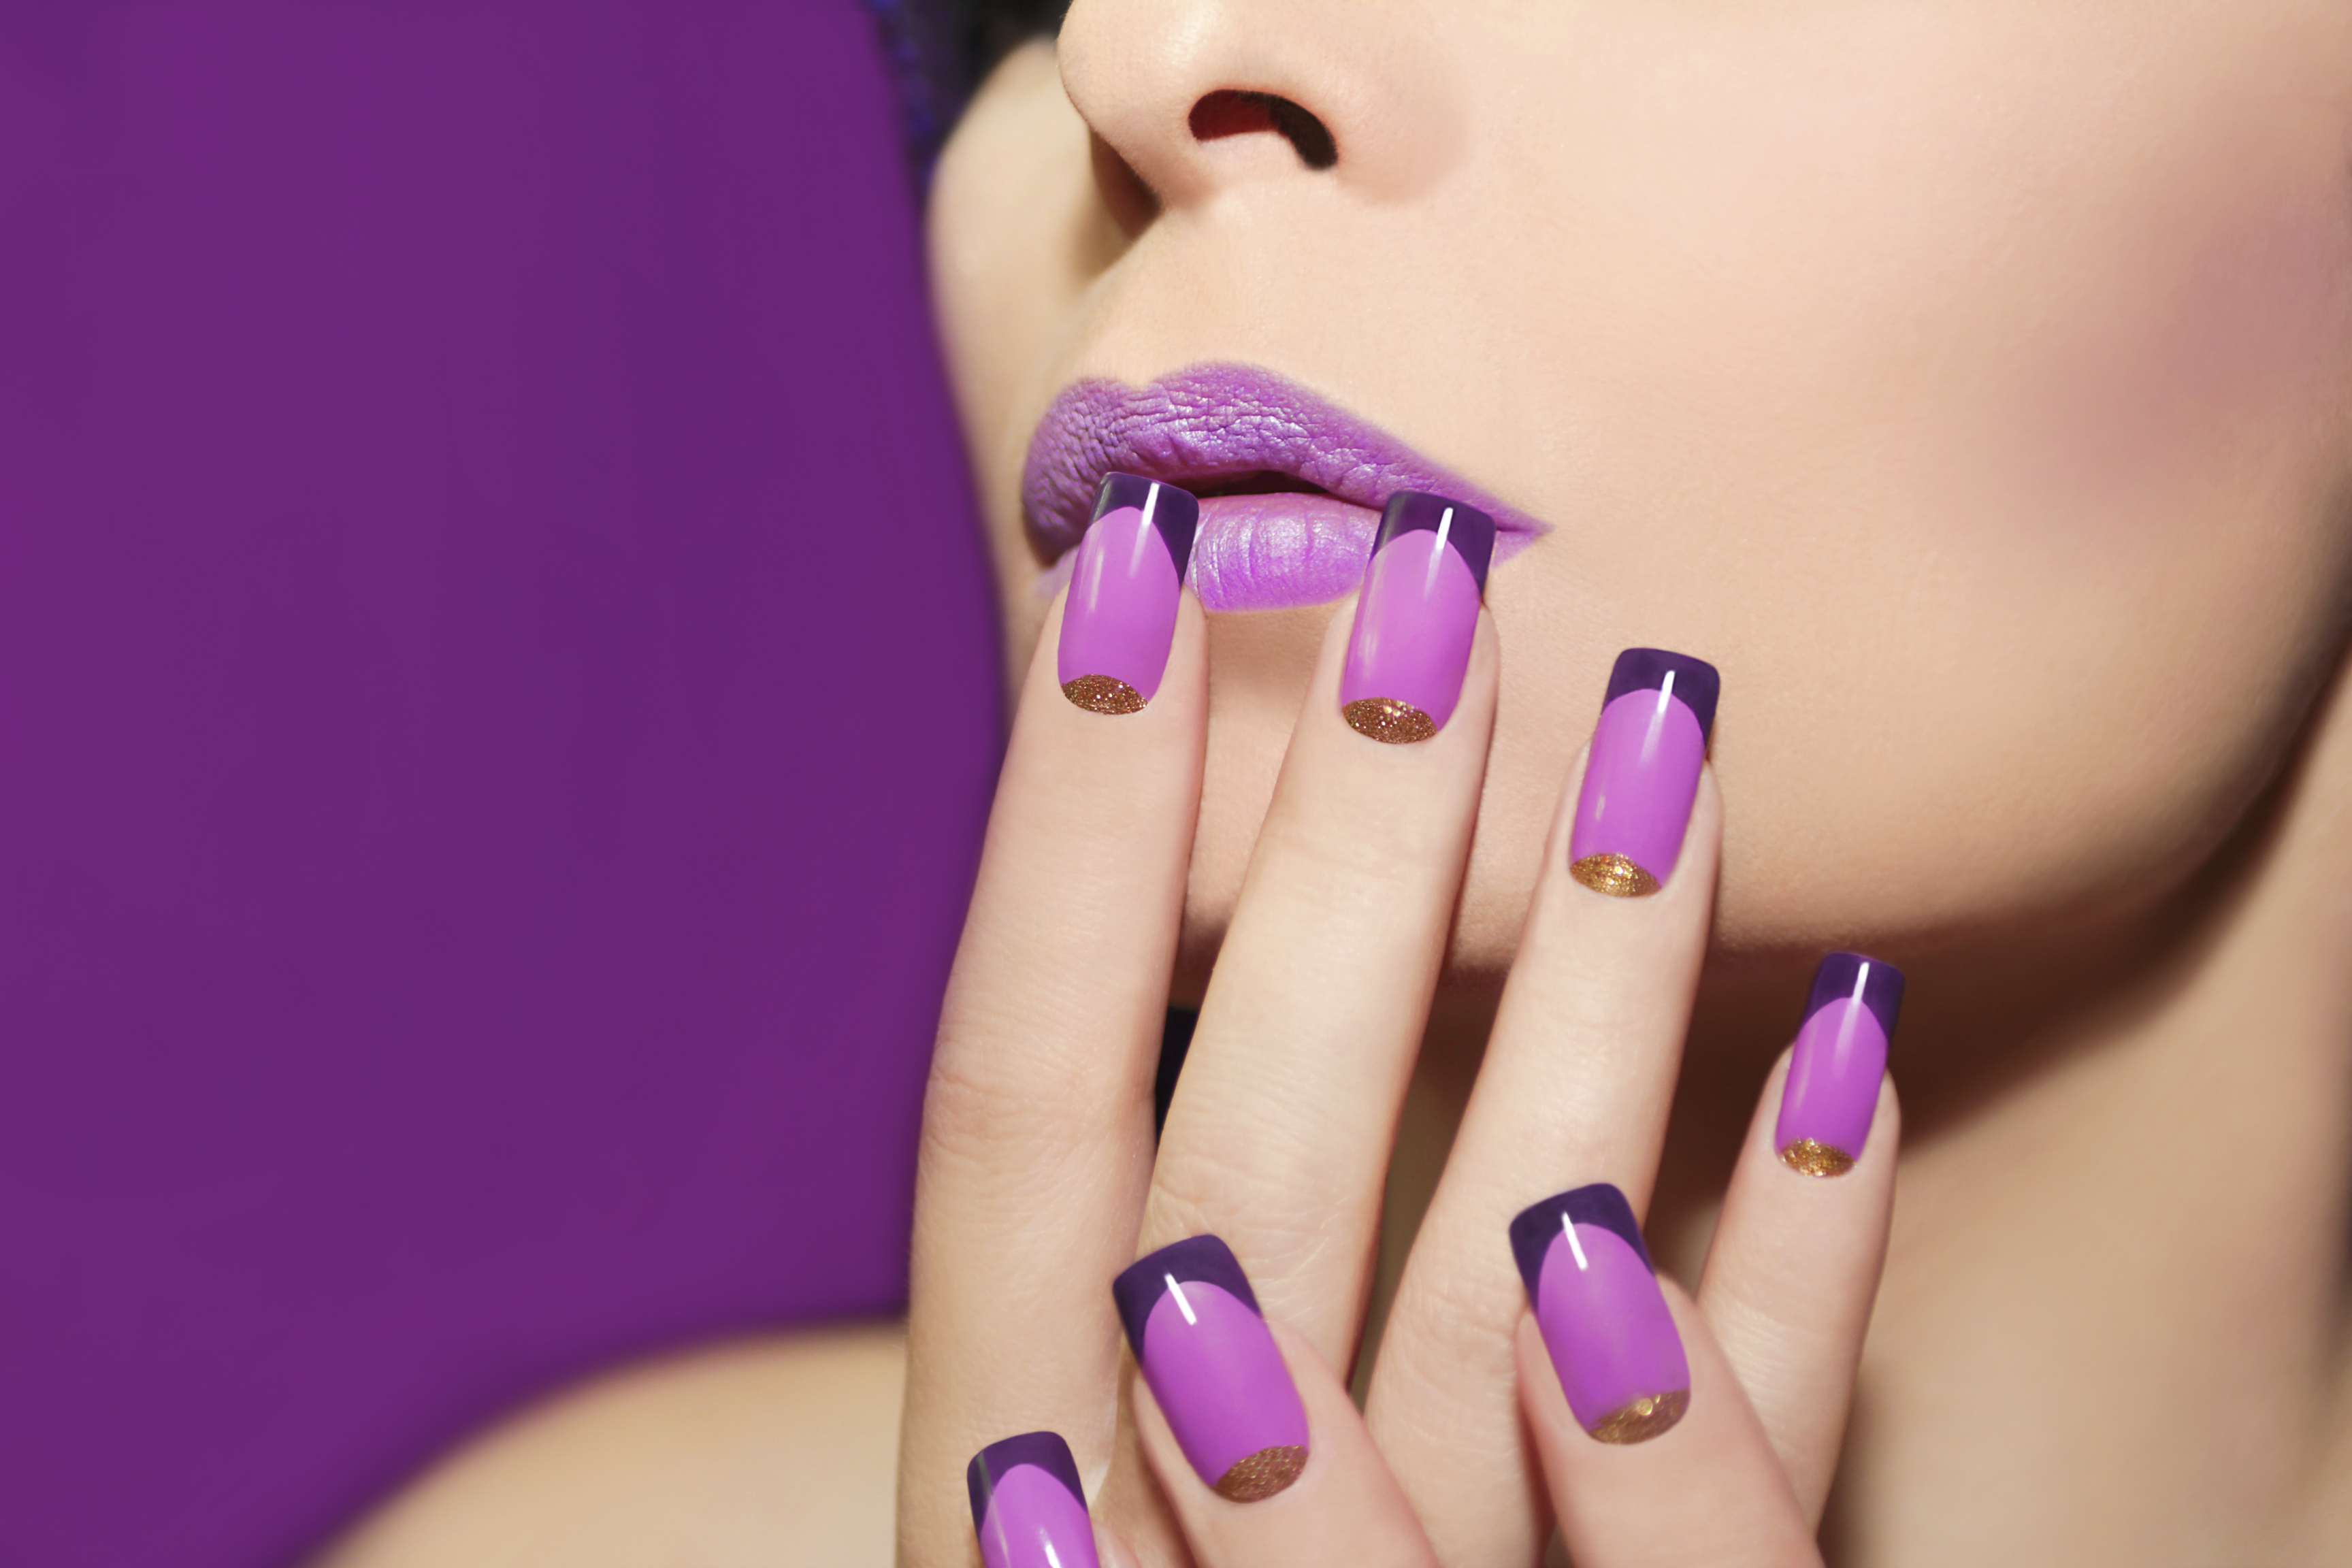 Choosing Between Gel Nails and Acrylic Nails | LoveToKnow